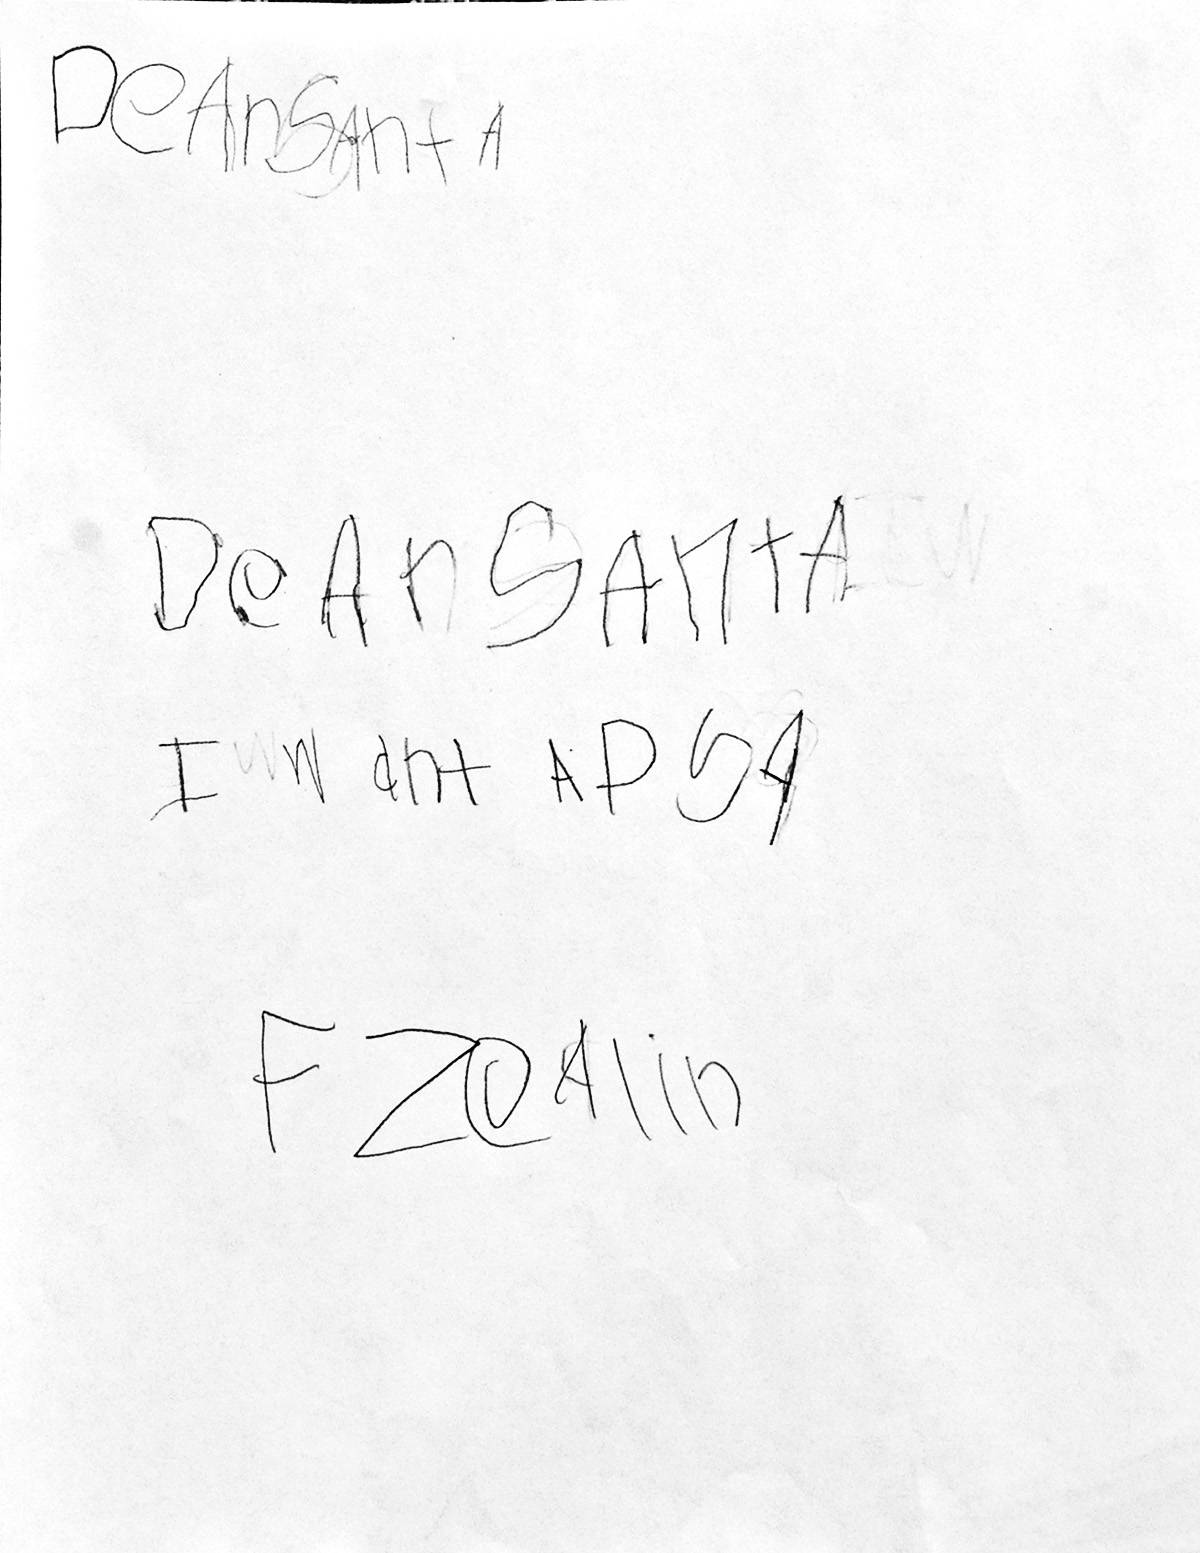 Zealin, Grade 1, Glenwood Elementary